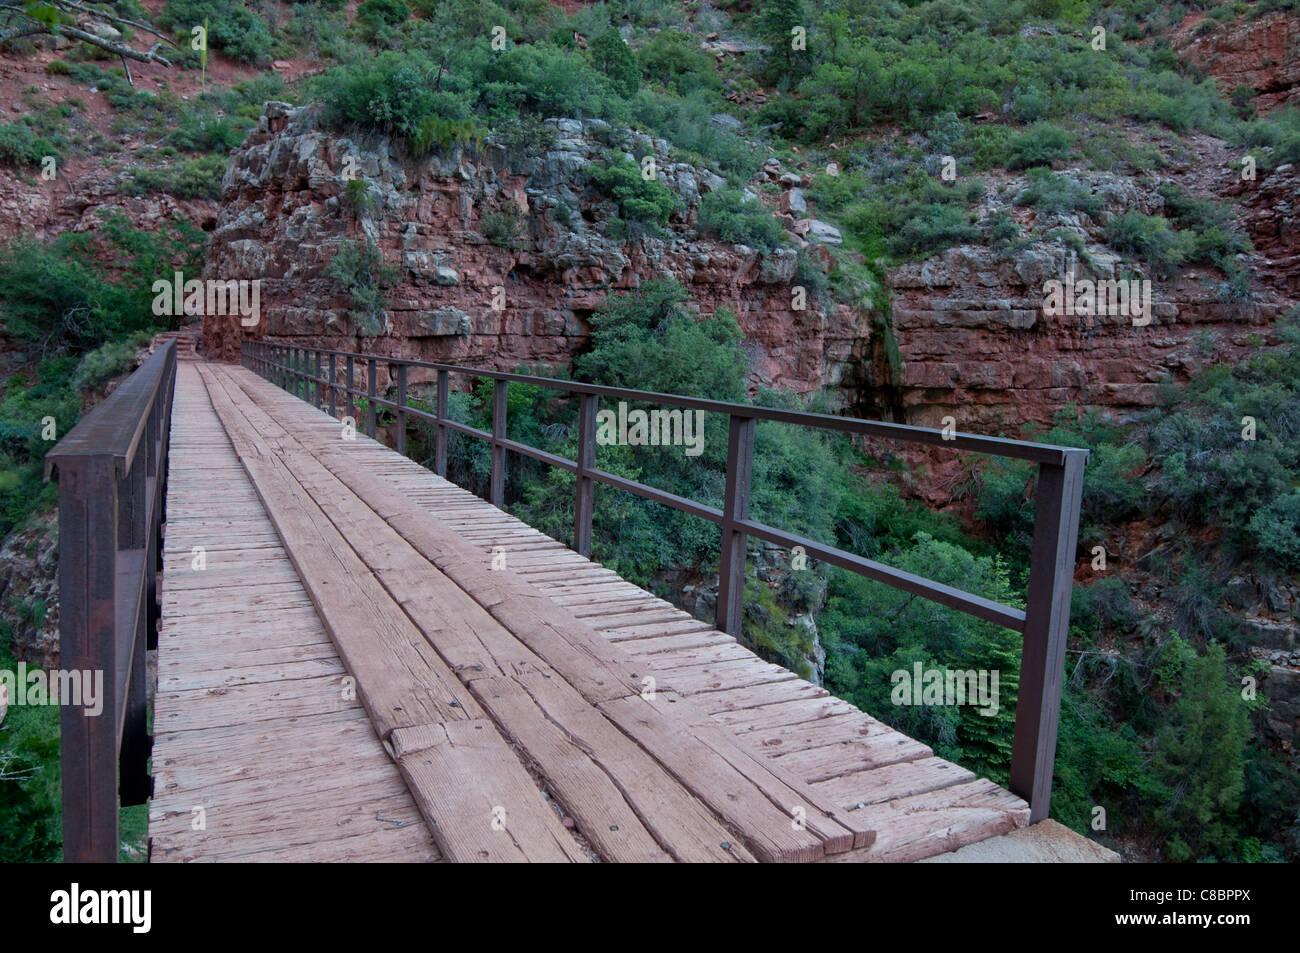 A bridge crosses a gap along the North Kaibab trail along its descent in Grand Canyon National Park, Arizona USA. - Stock Image